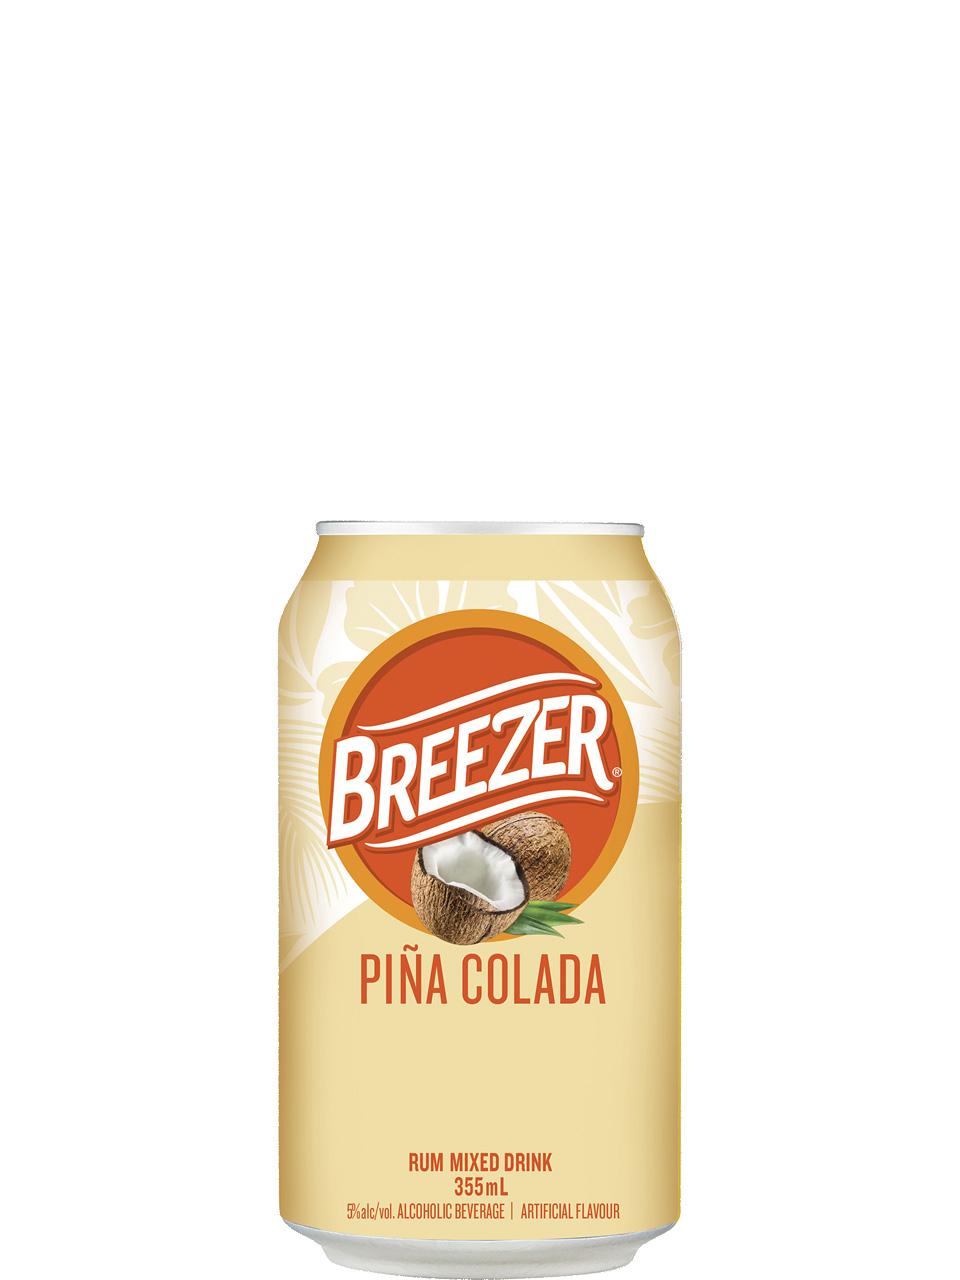 Breezer Pina Colada 6 Pack Cans